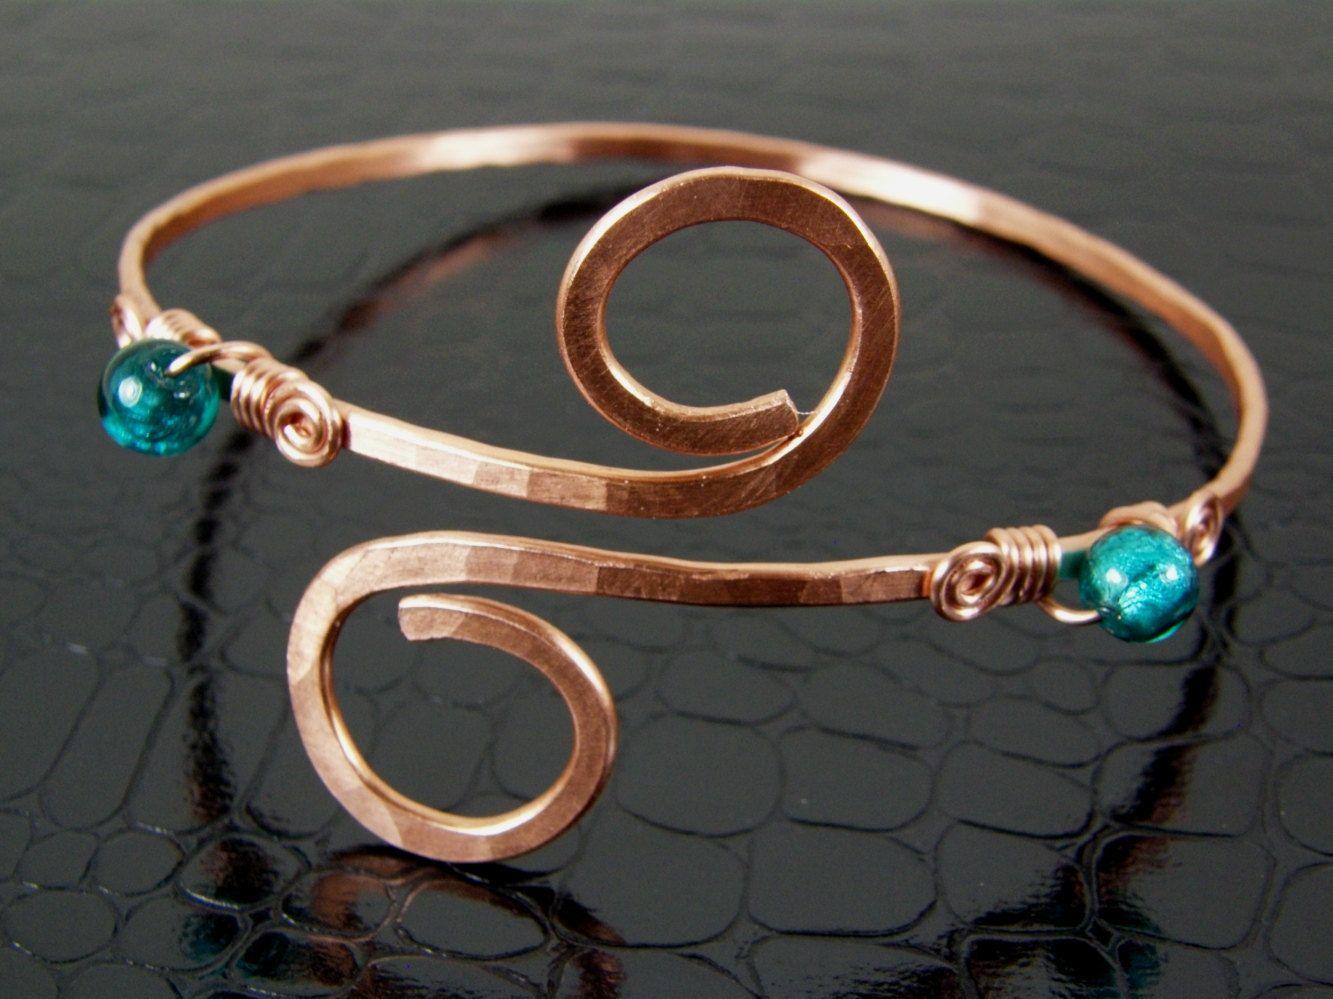 Womens Copper Upper Arm Cuff Bracelet Teal, Aqua Hand Crafted